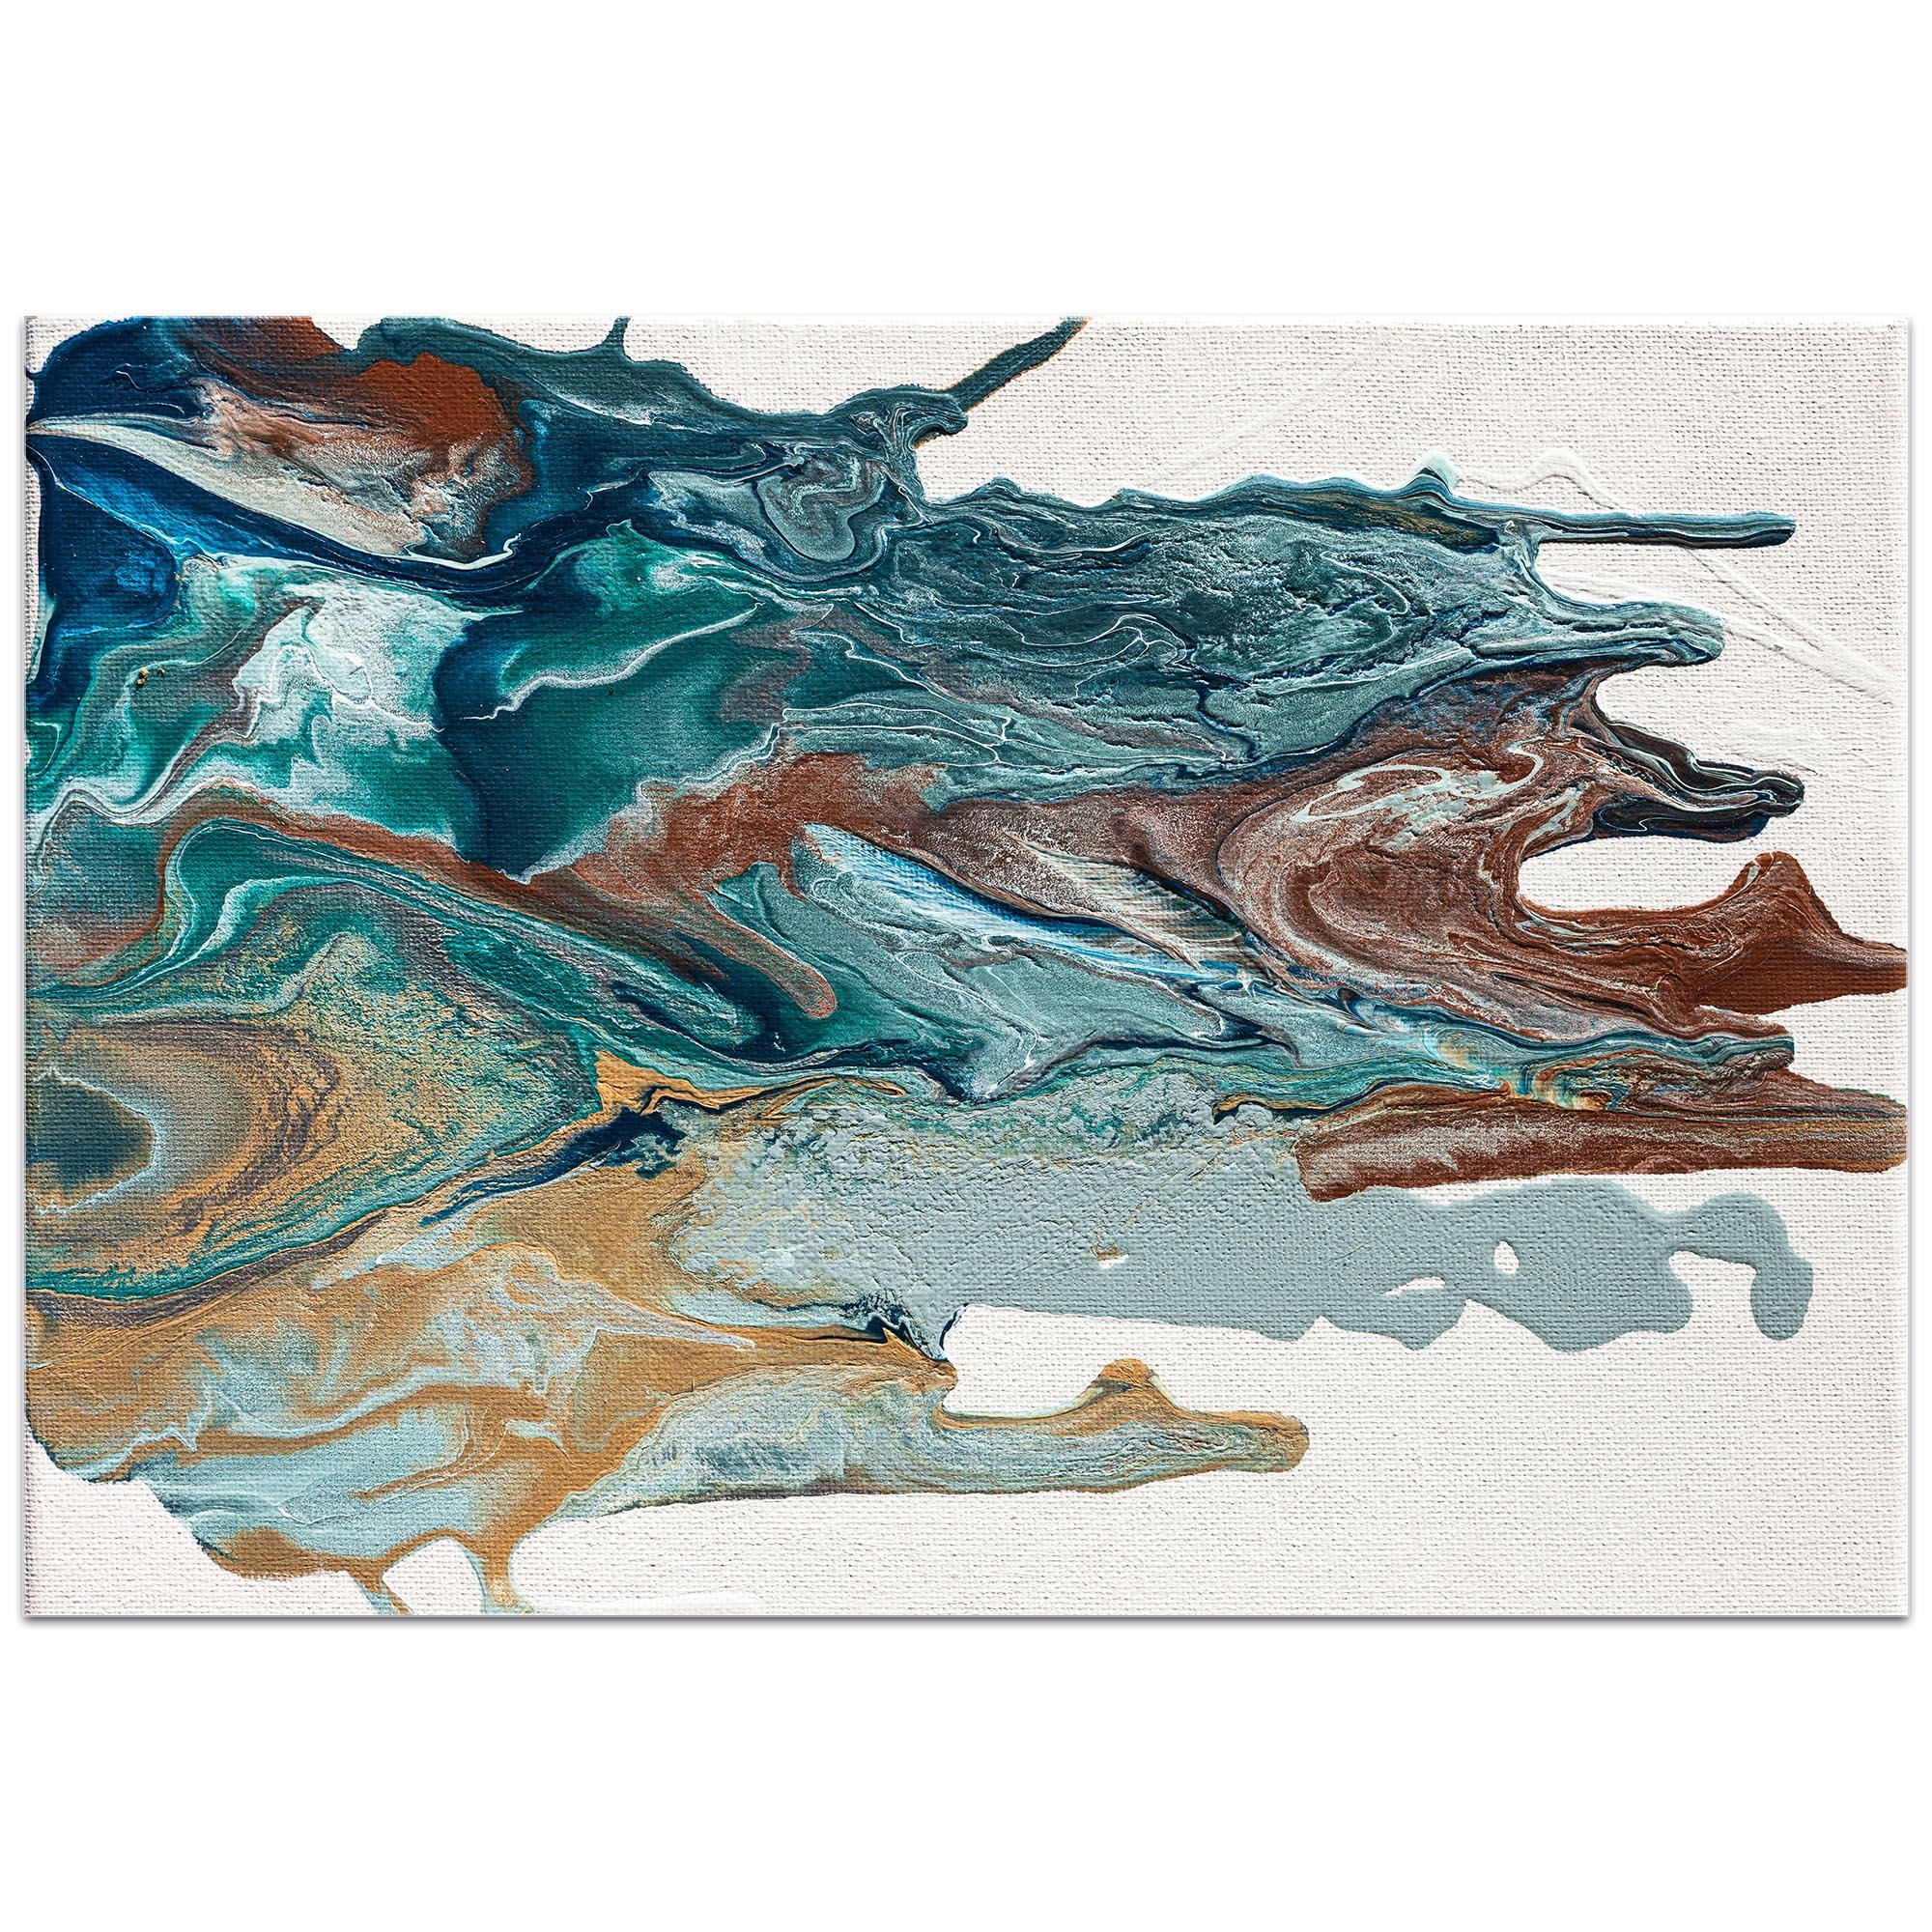 Abstract Wall Art 'Earth 1' - Urban Splatter Decor on Metal or Plexiglass - Image 2